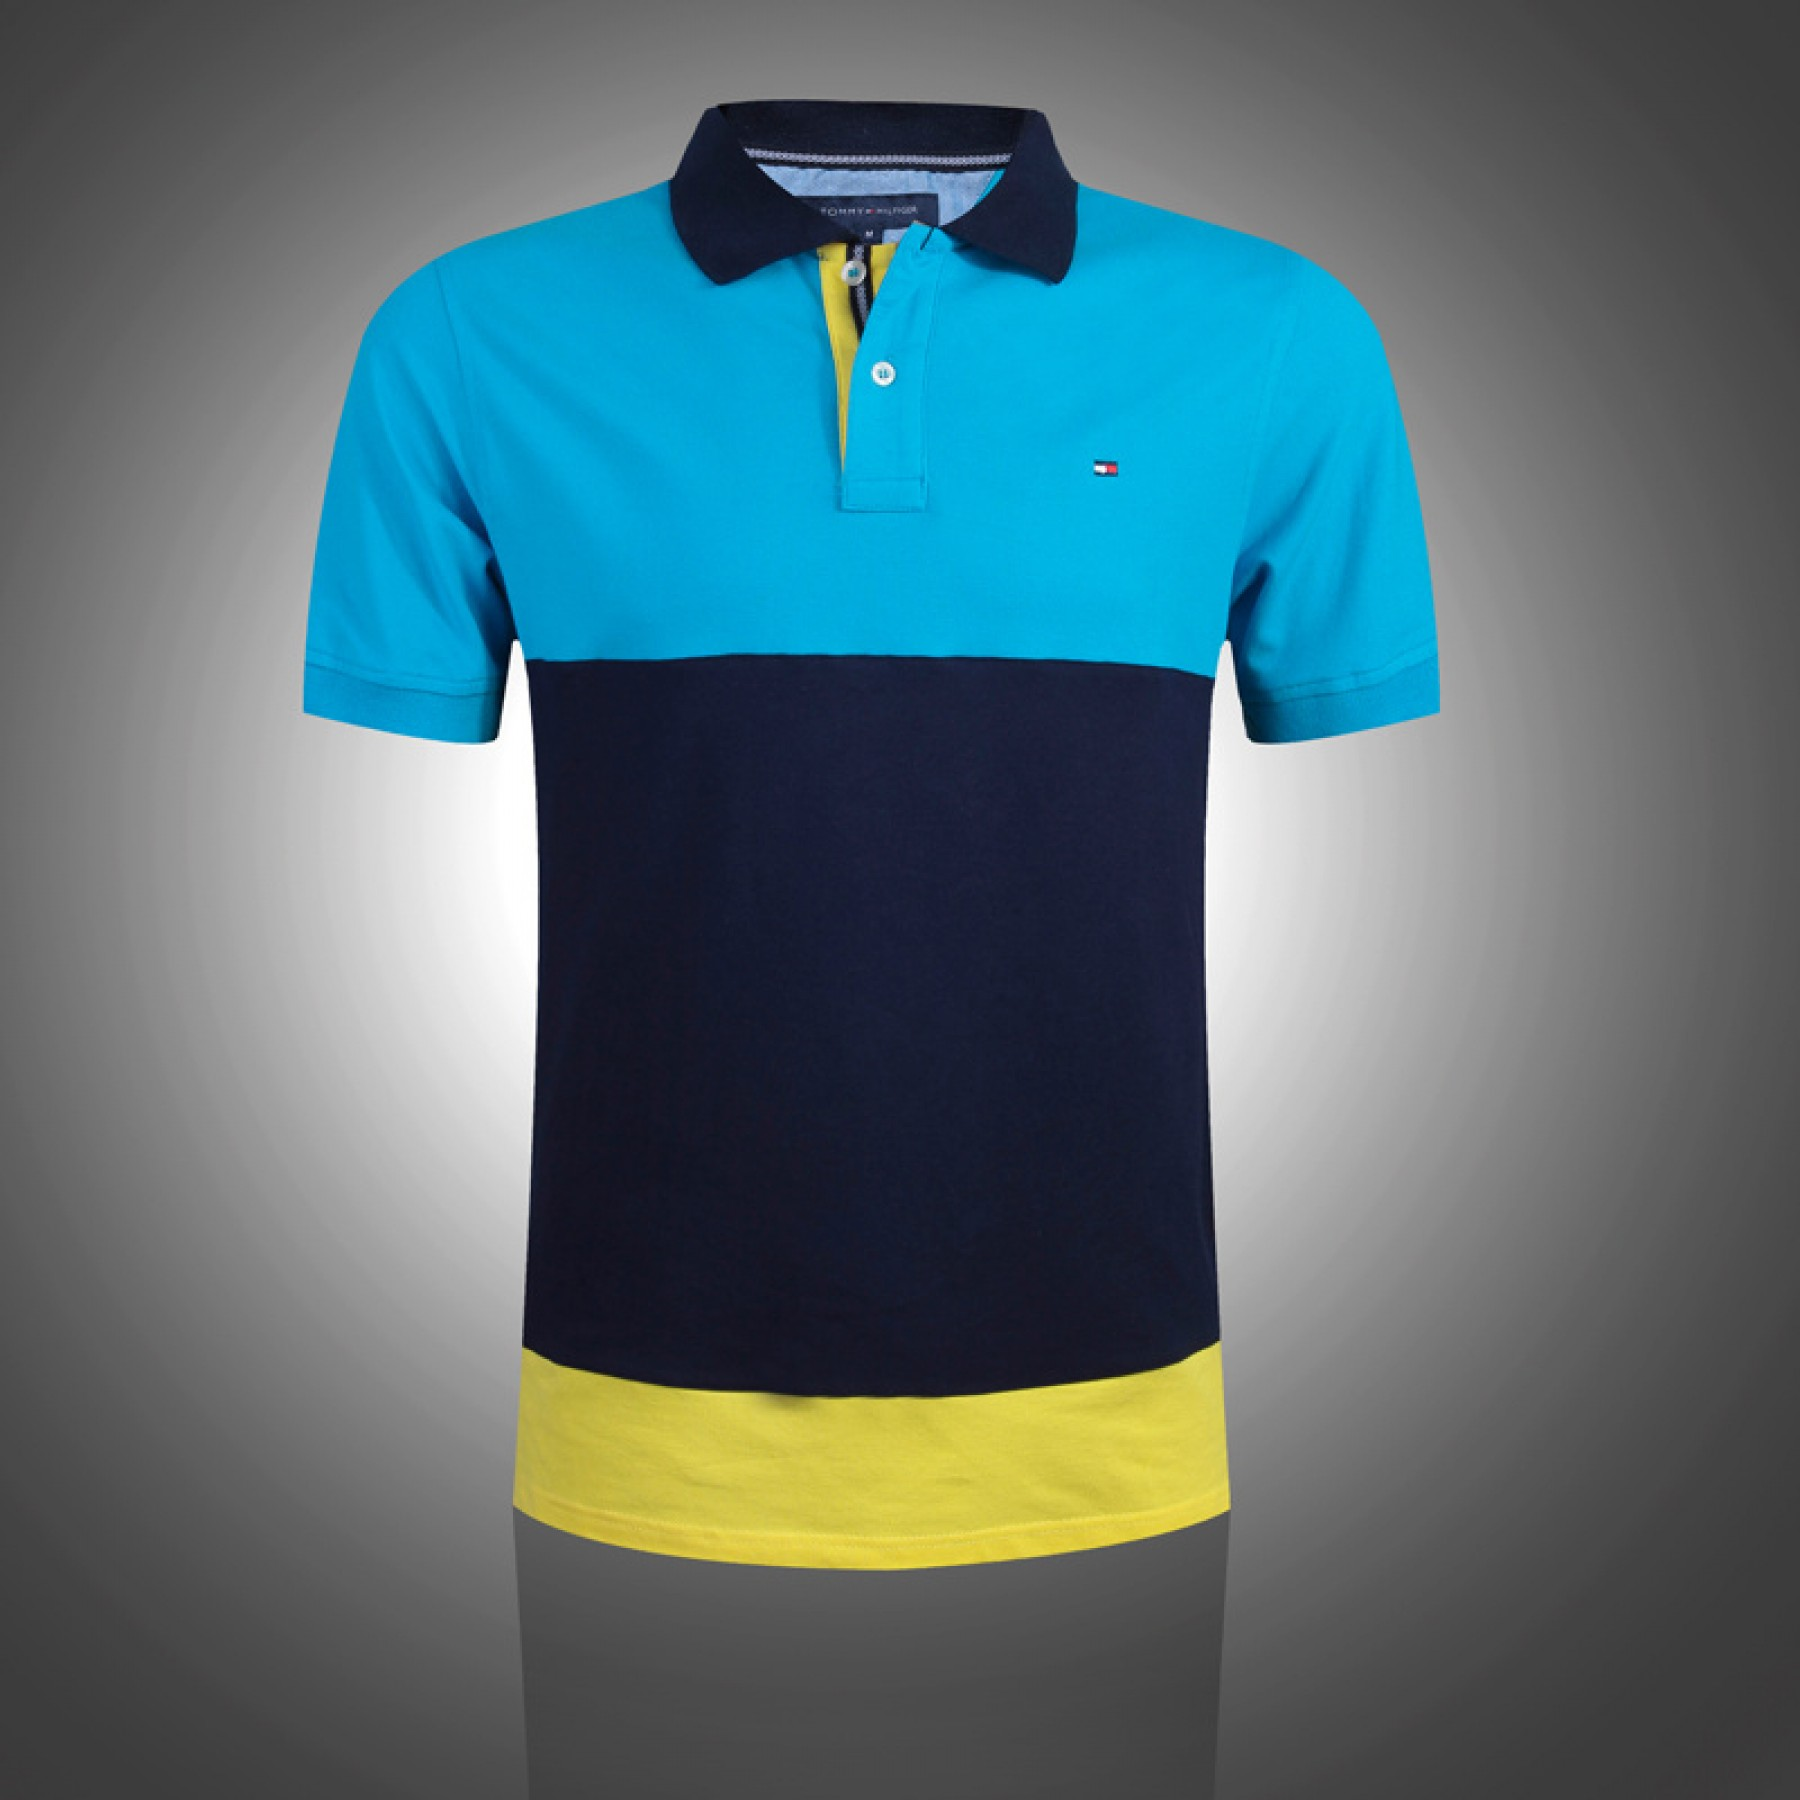 Camisa Polo Masculina Tommy Hilfiger Cod 0362 4d0fff880fb5c